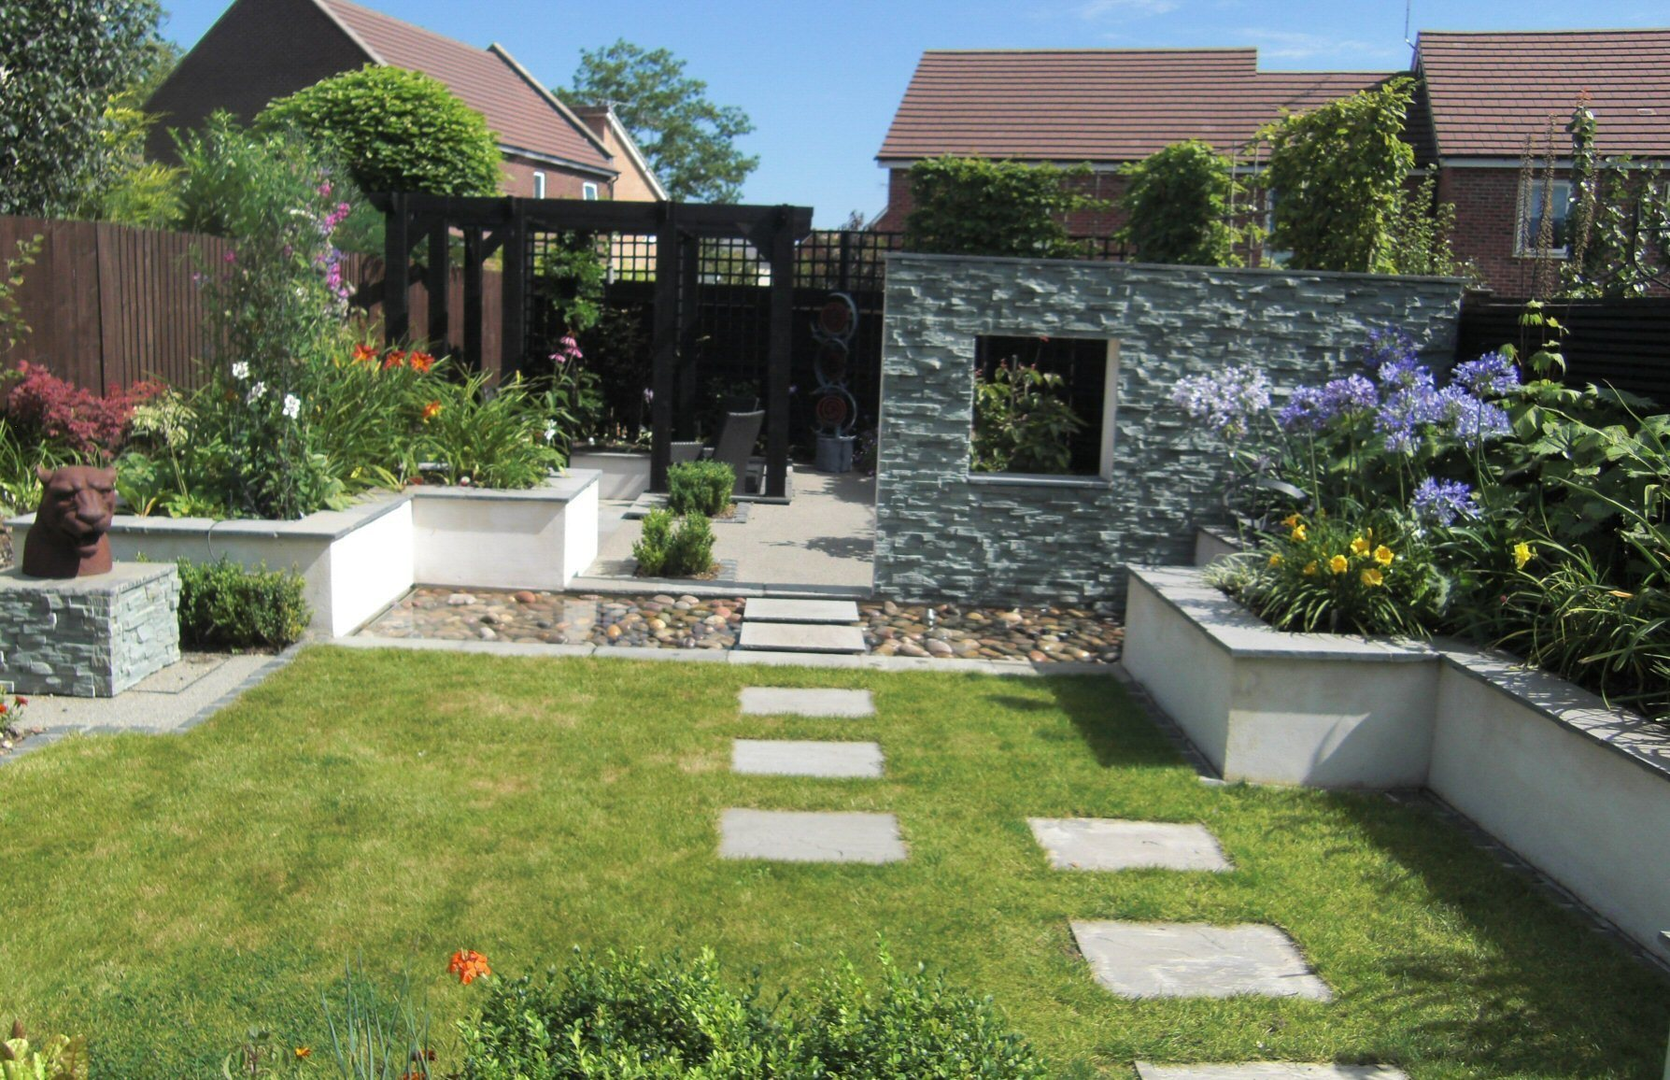 Linsey Evans Garden Design: مصممون مساحات خارجية في Bracknell, UK